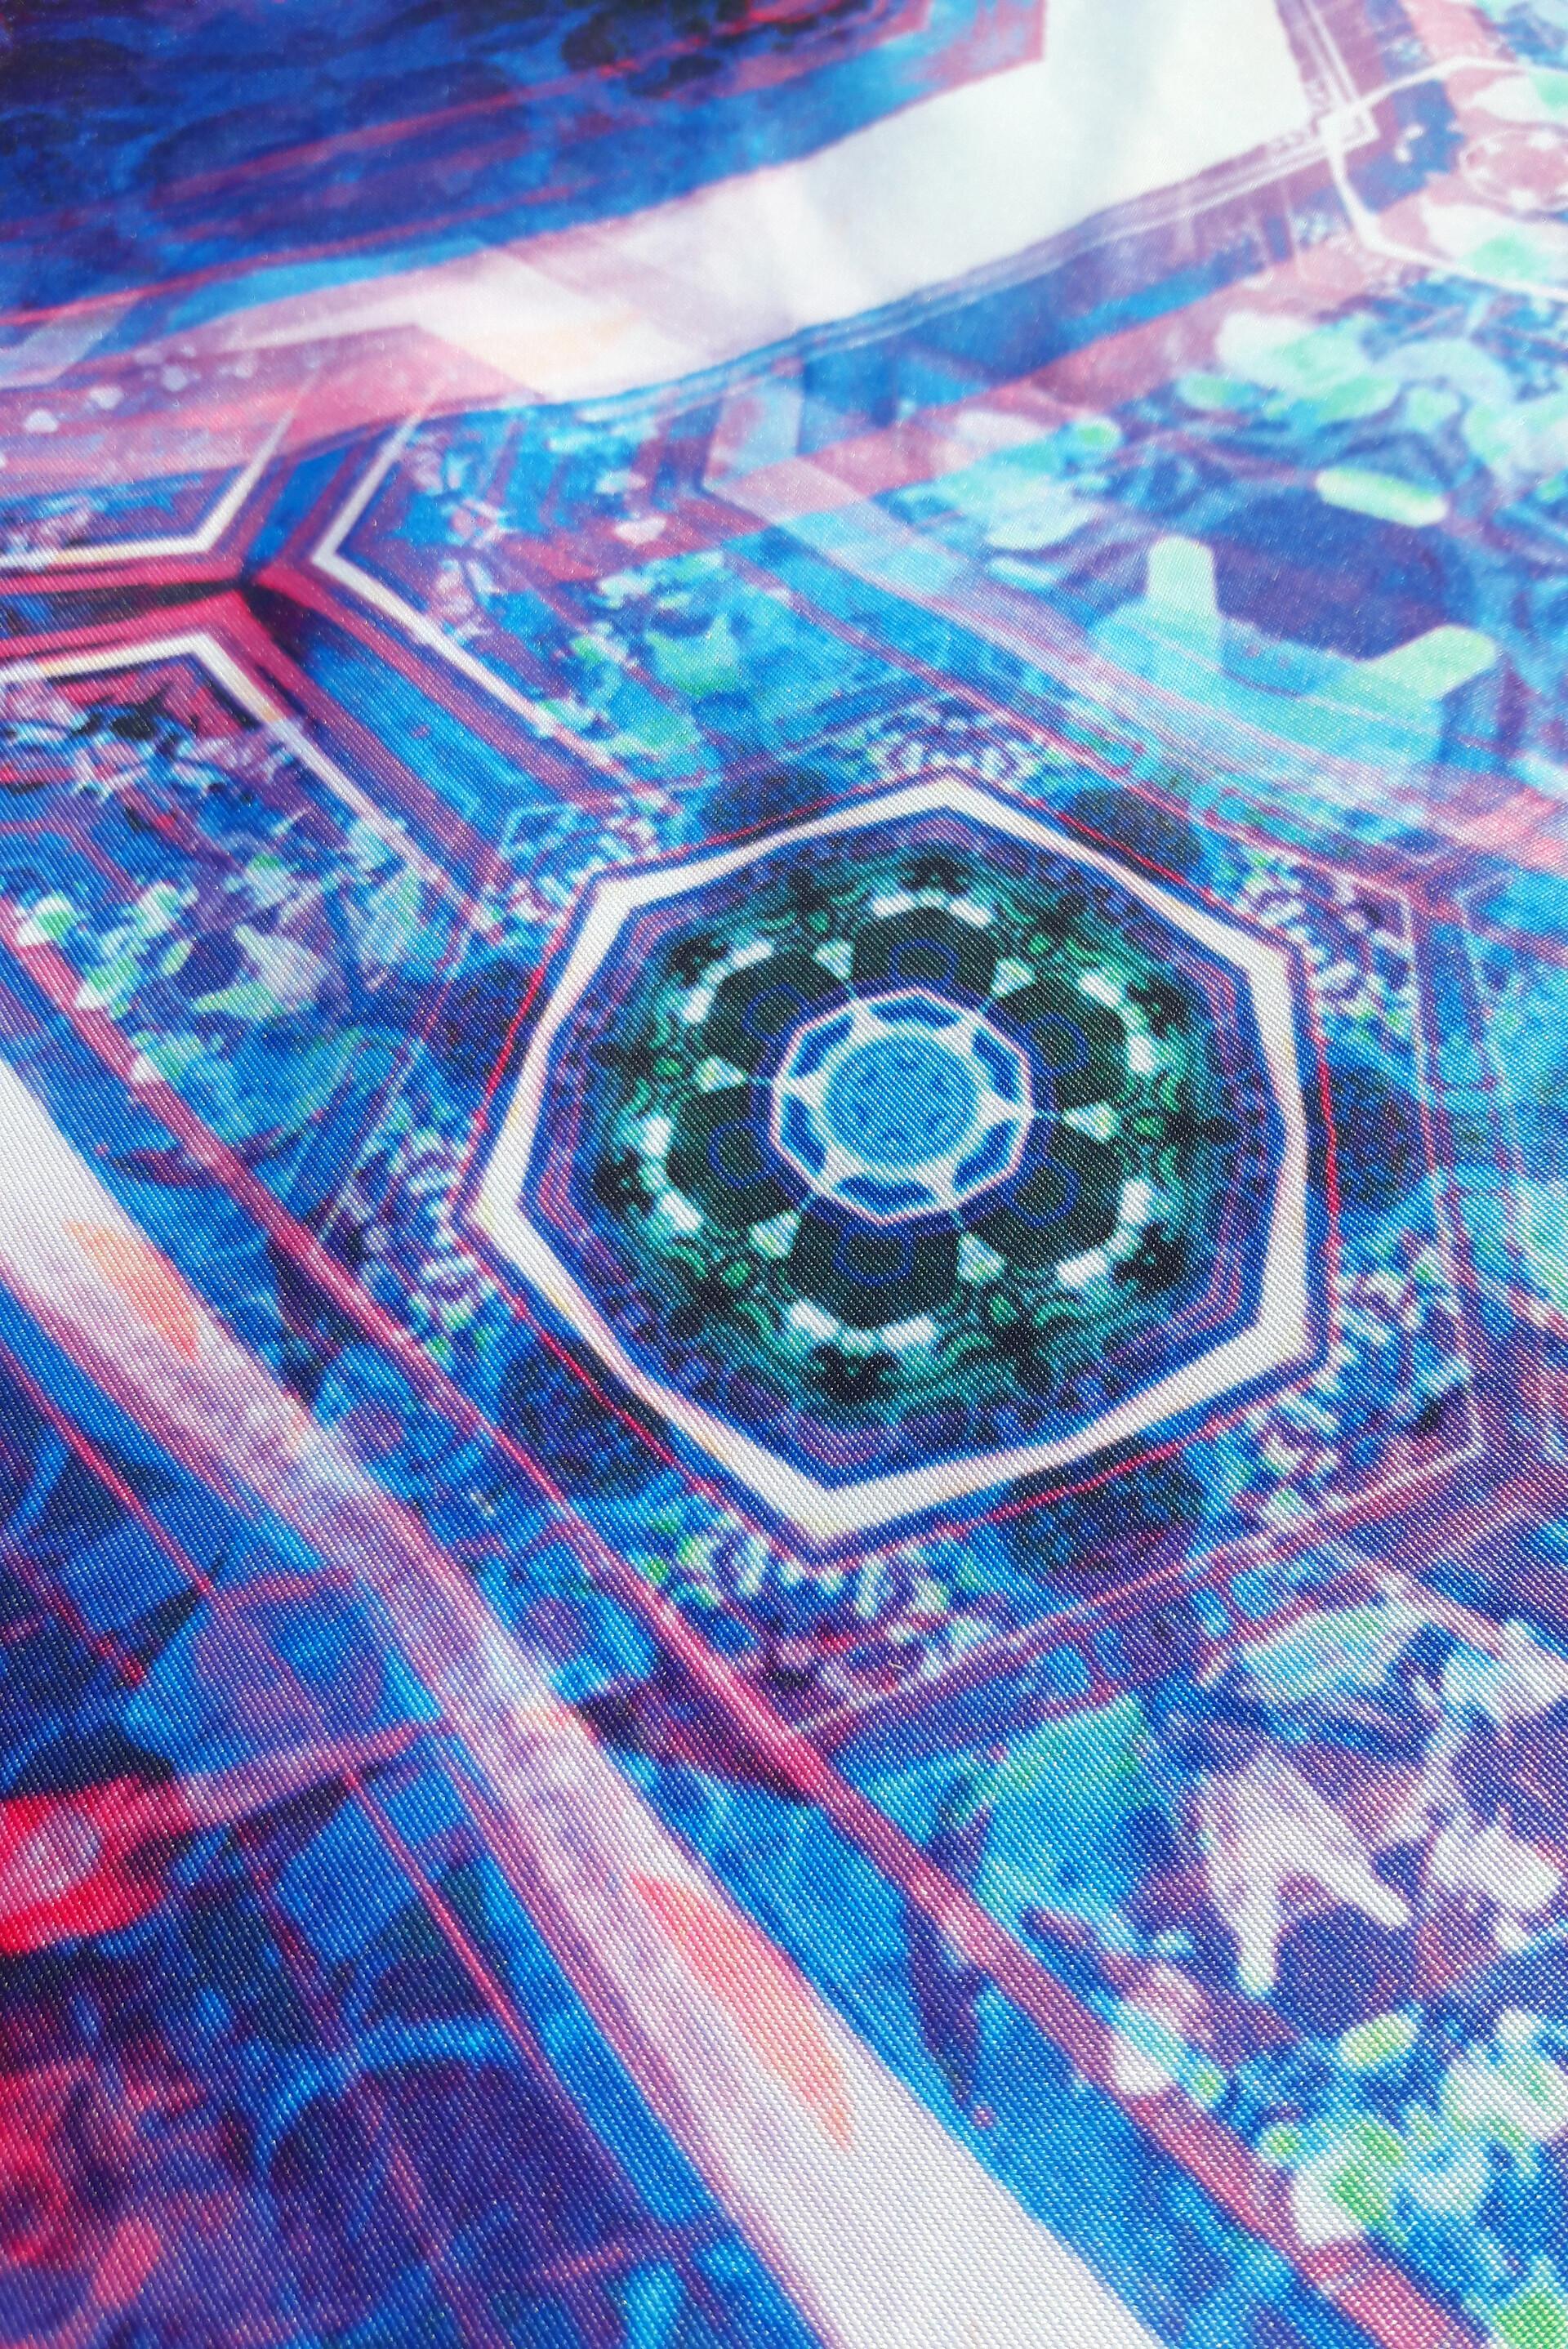 Natural warp oath of the jewel box tapestry medium detail 01